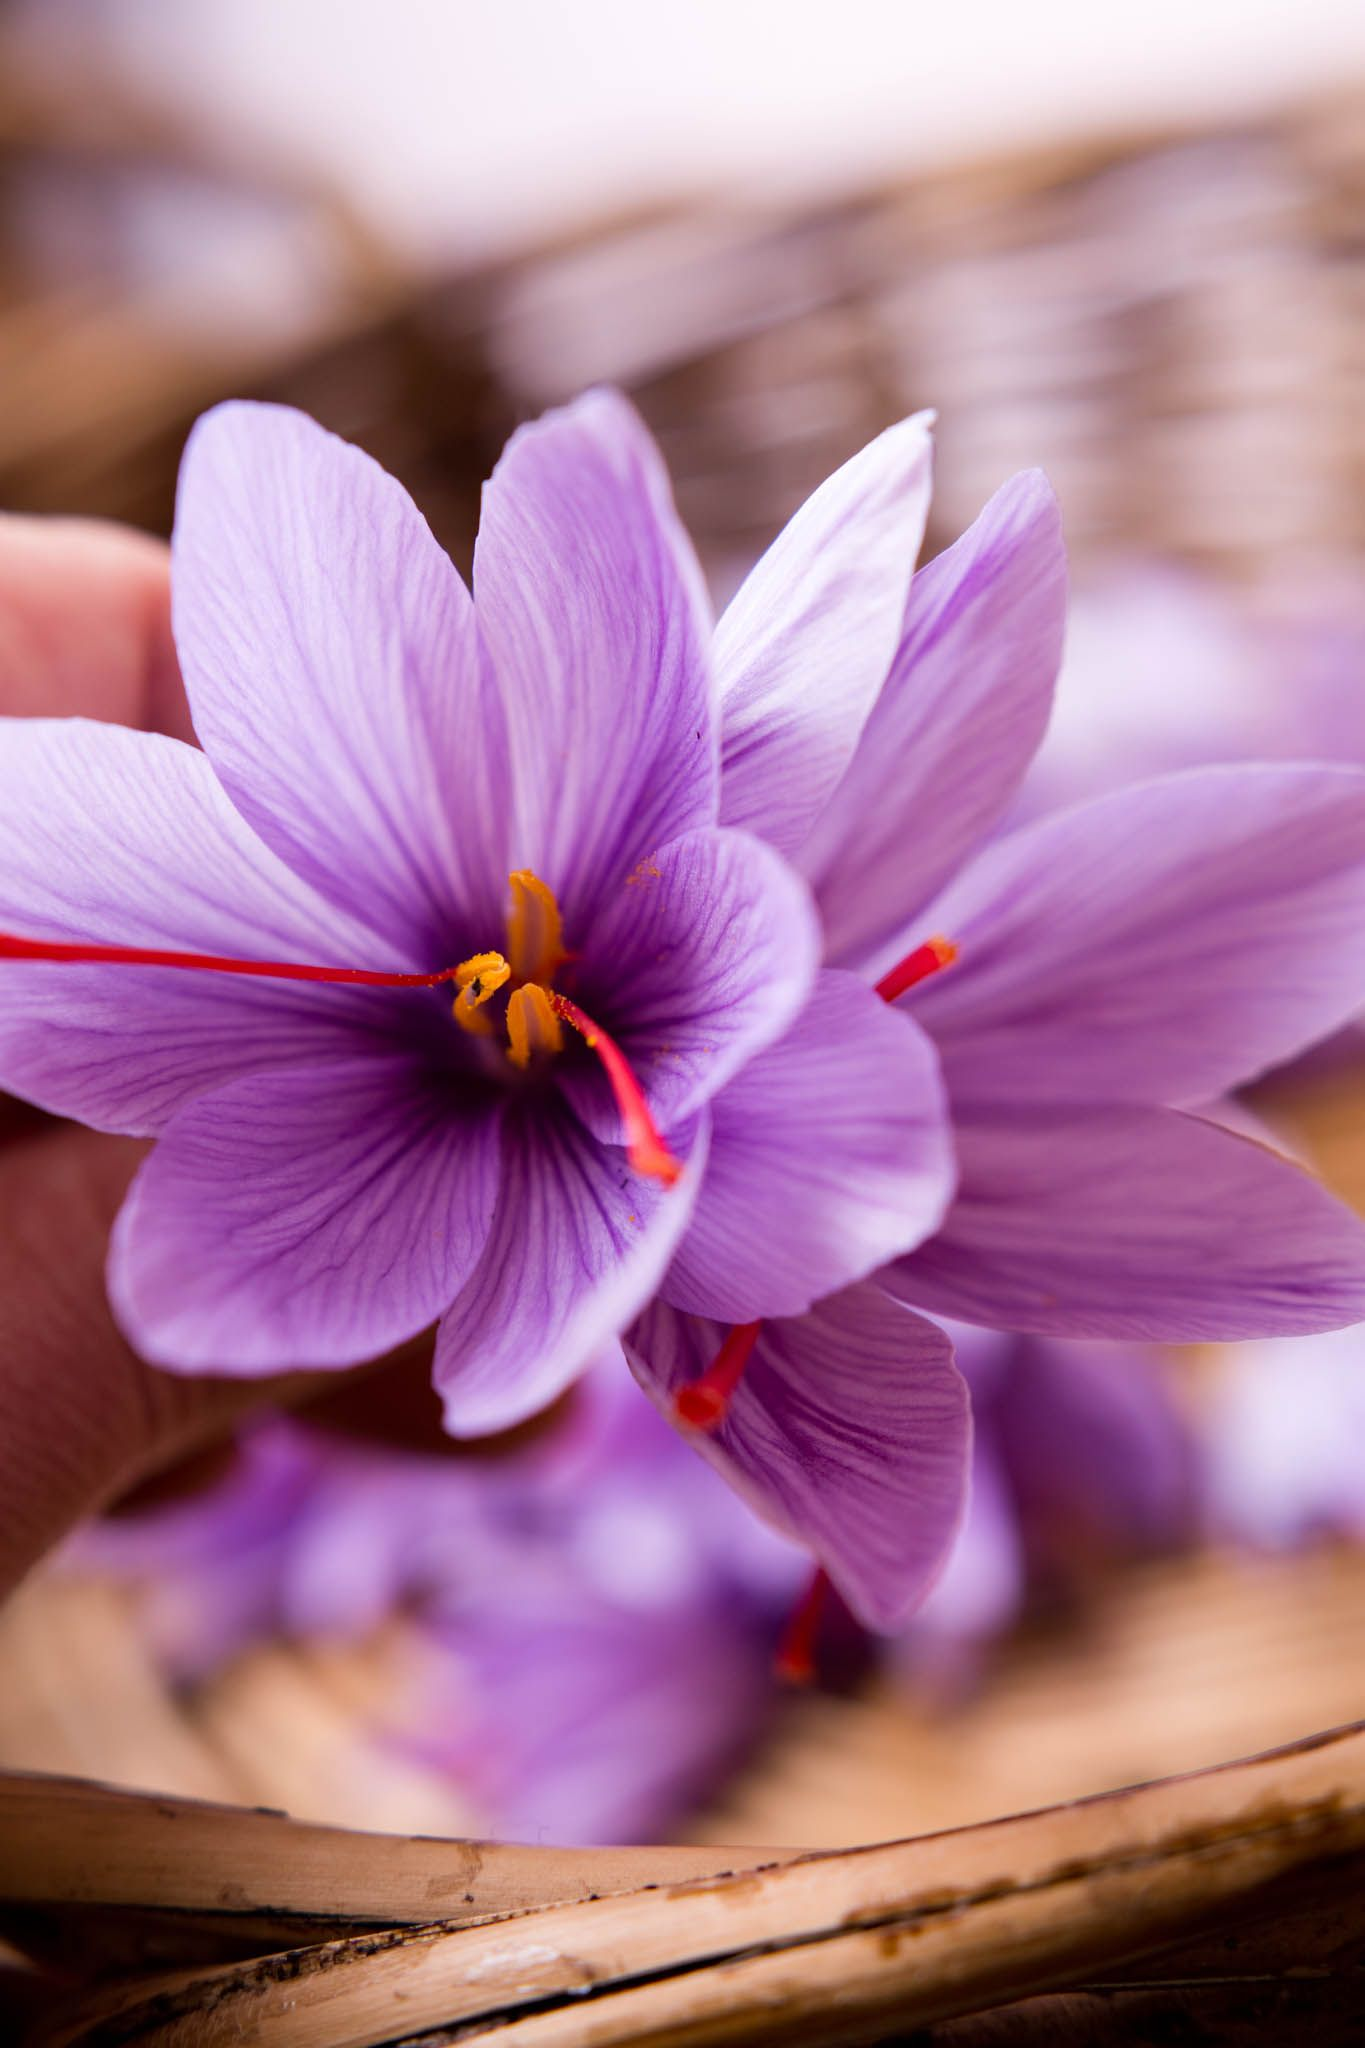 Freshly picked saffron (crocus sativus) flowers grown in ...